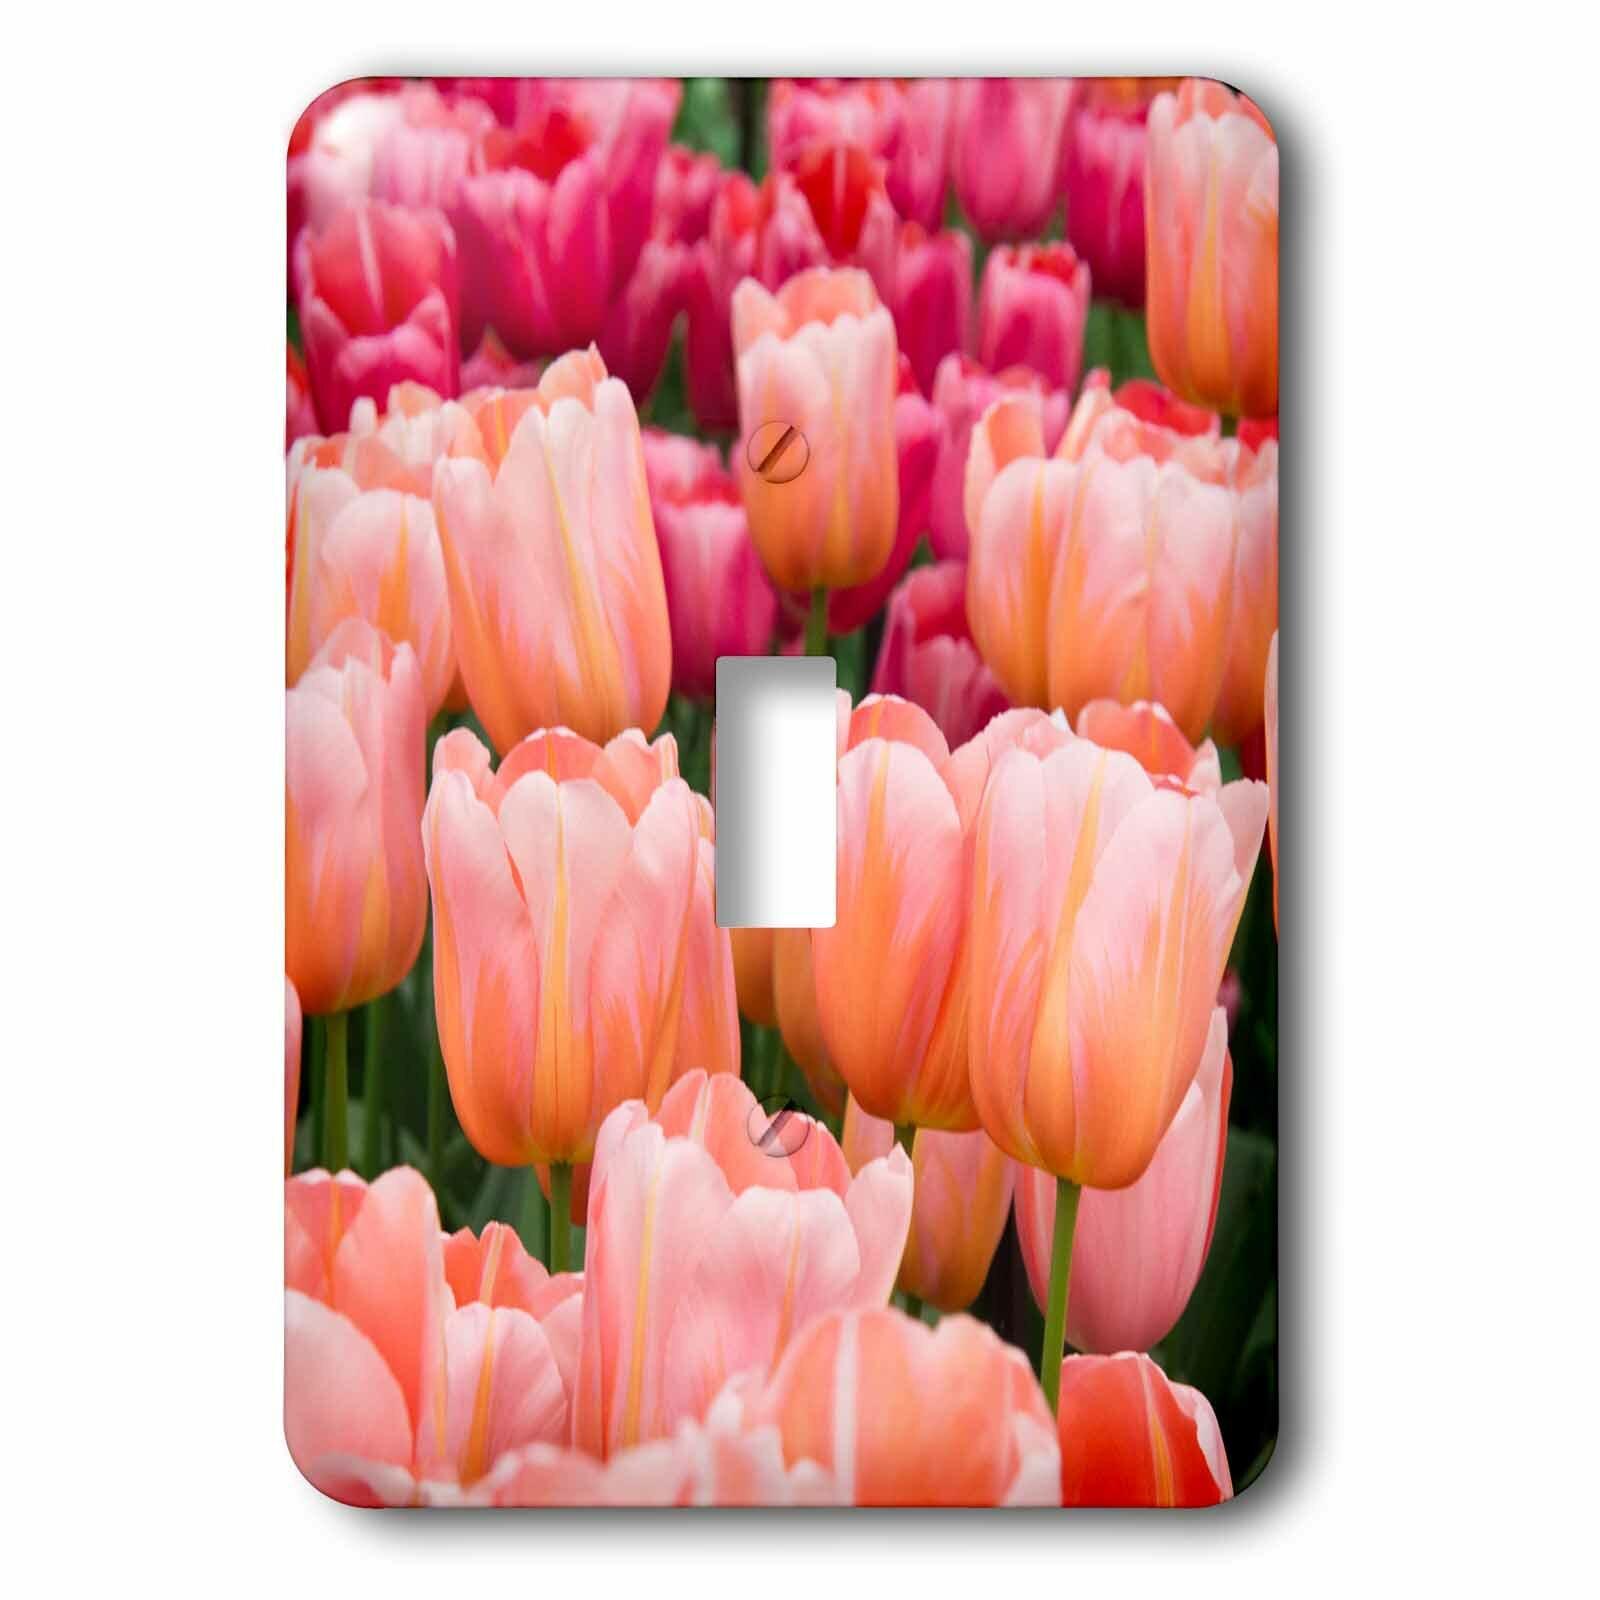 3drose Tulips 1 Gang Toggle Light Switch Wall Plate Wayfair